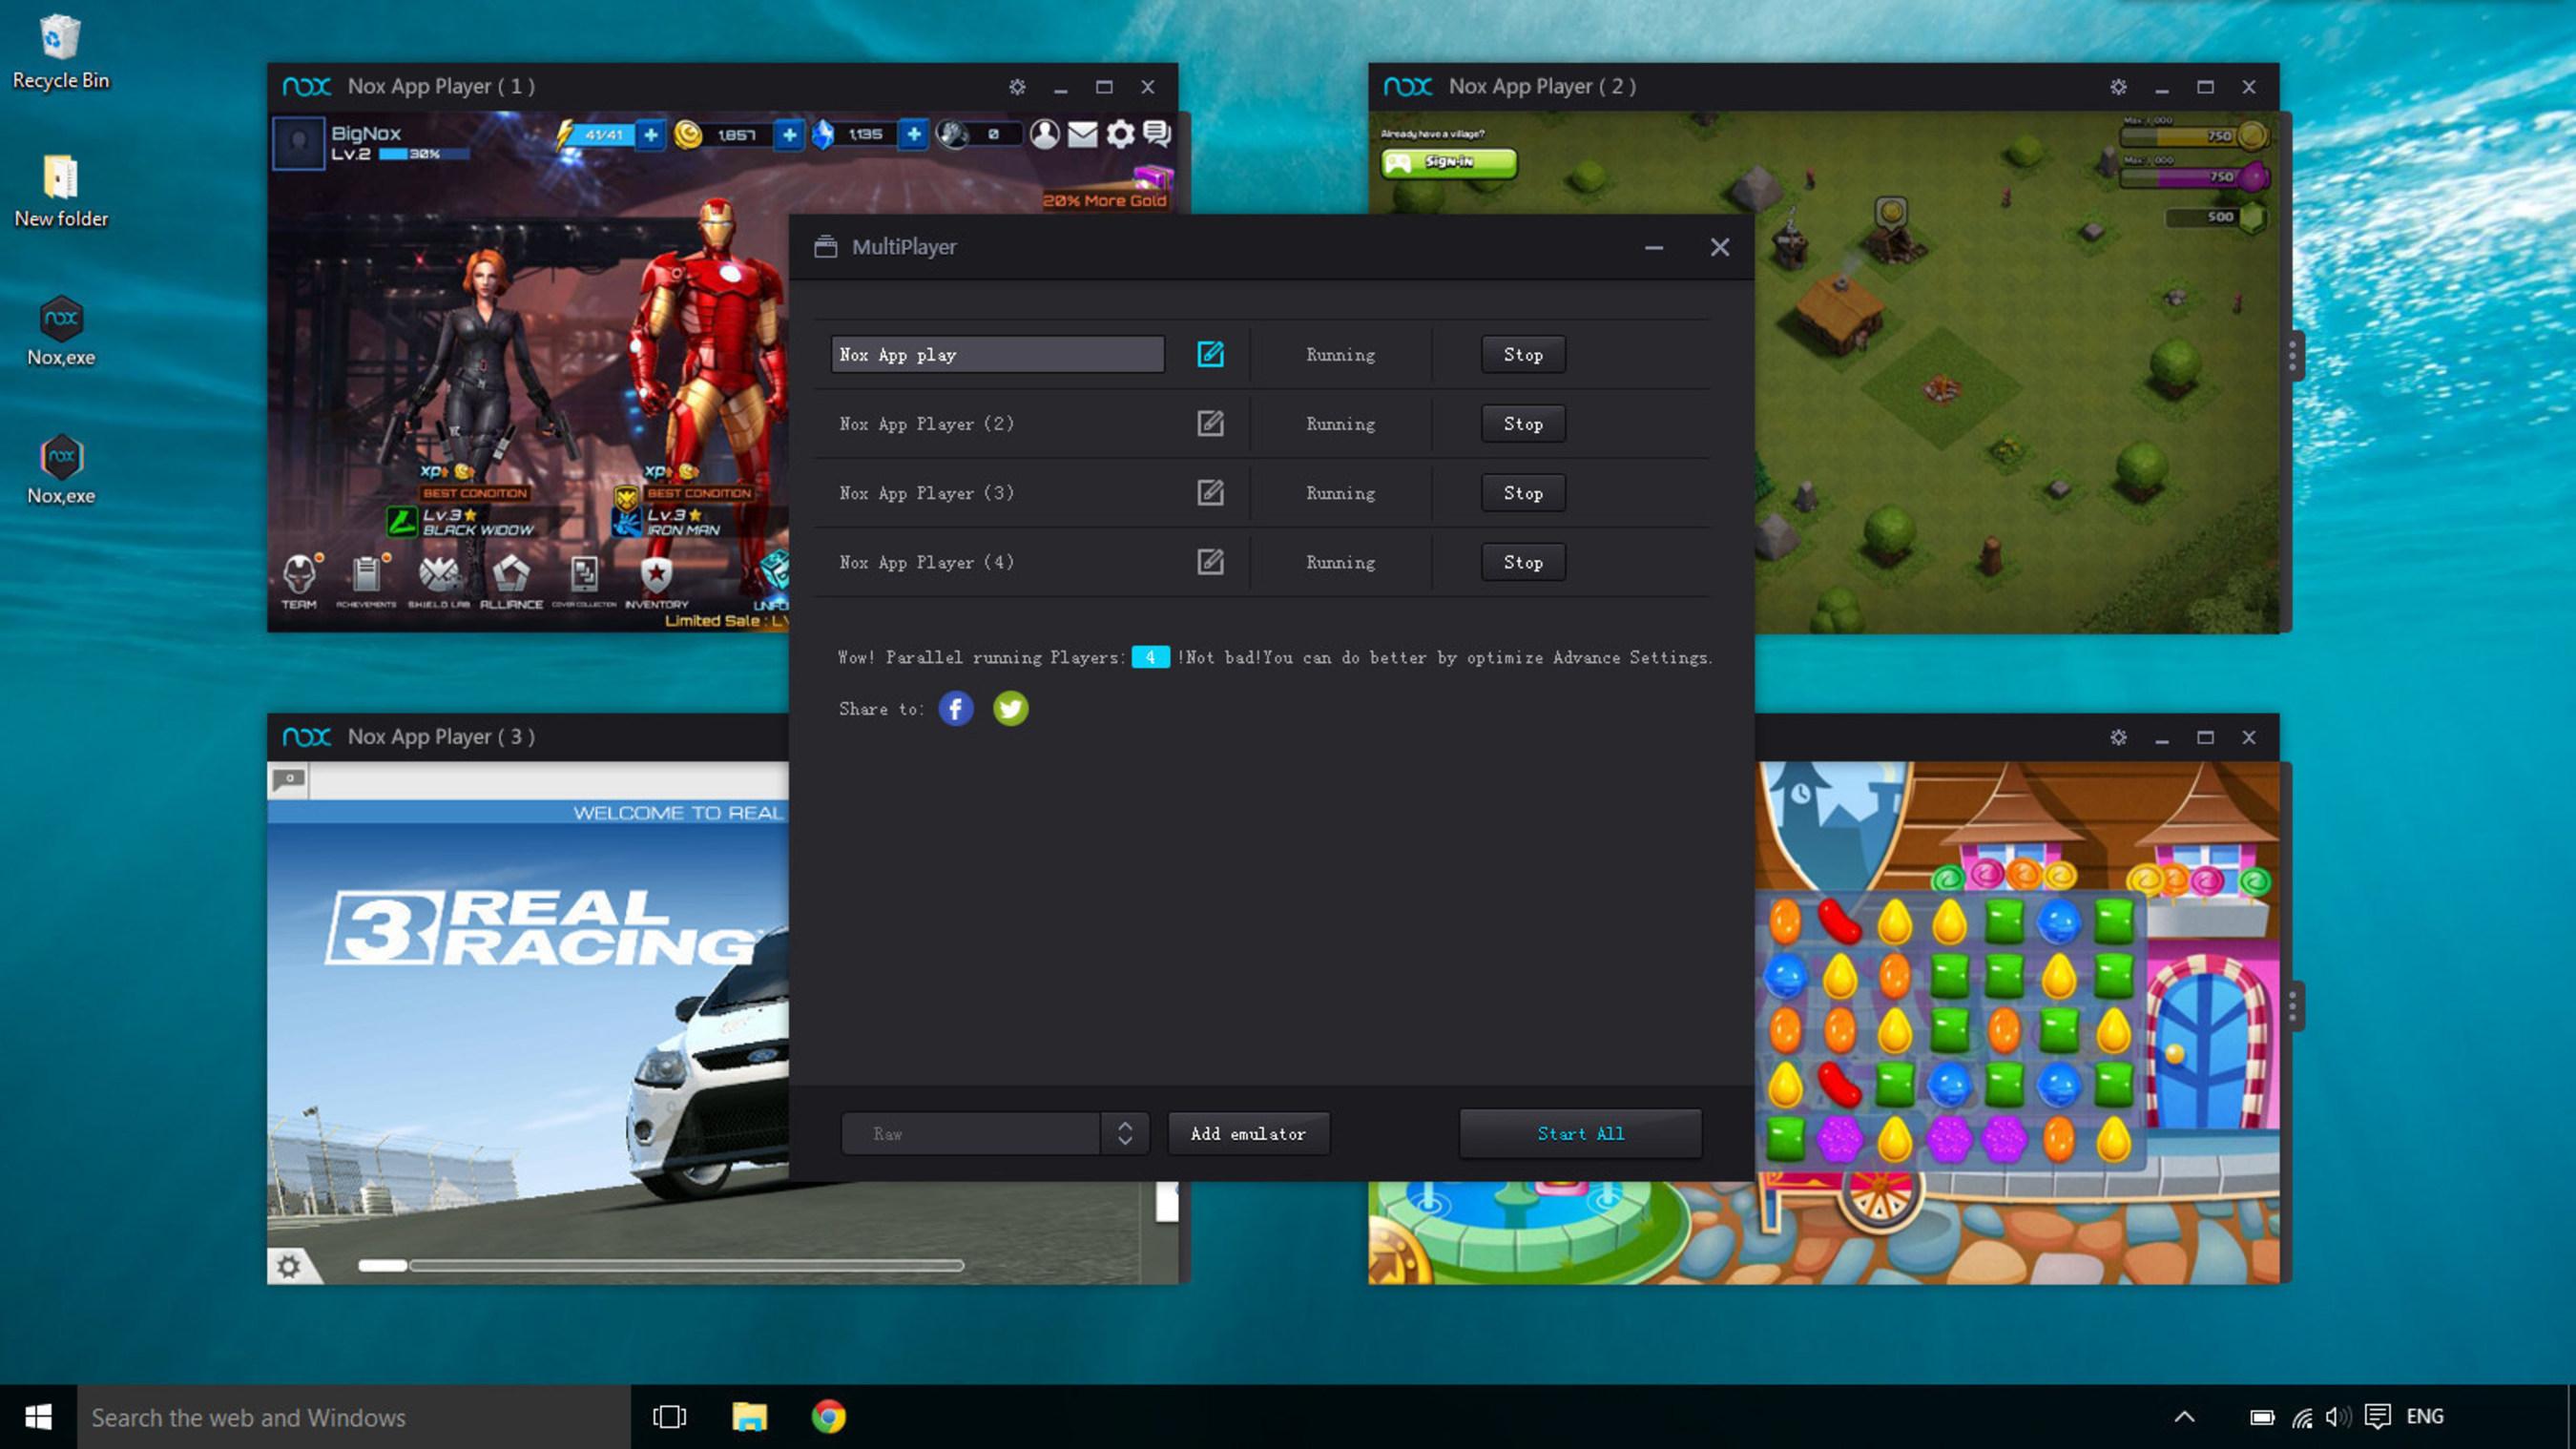 Nox App Player Android Emulator